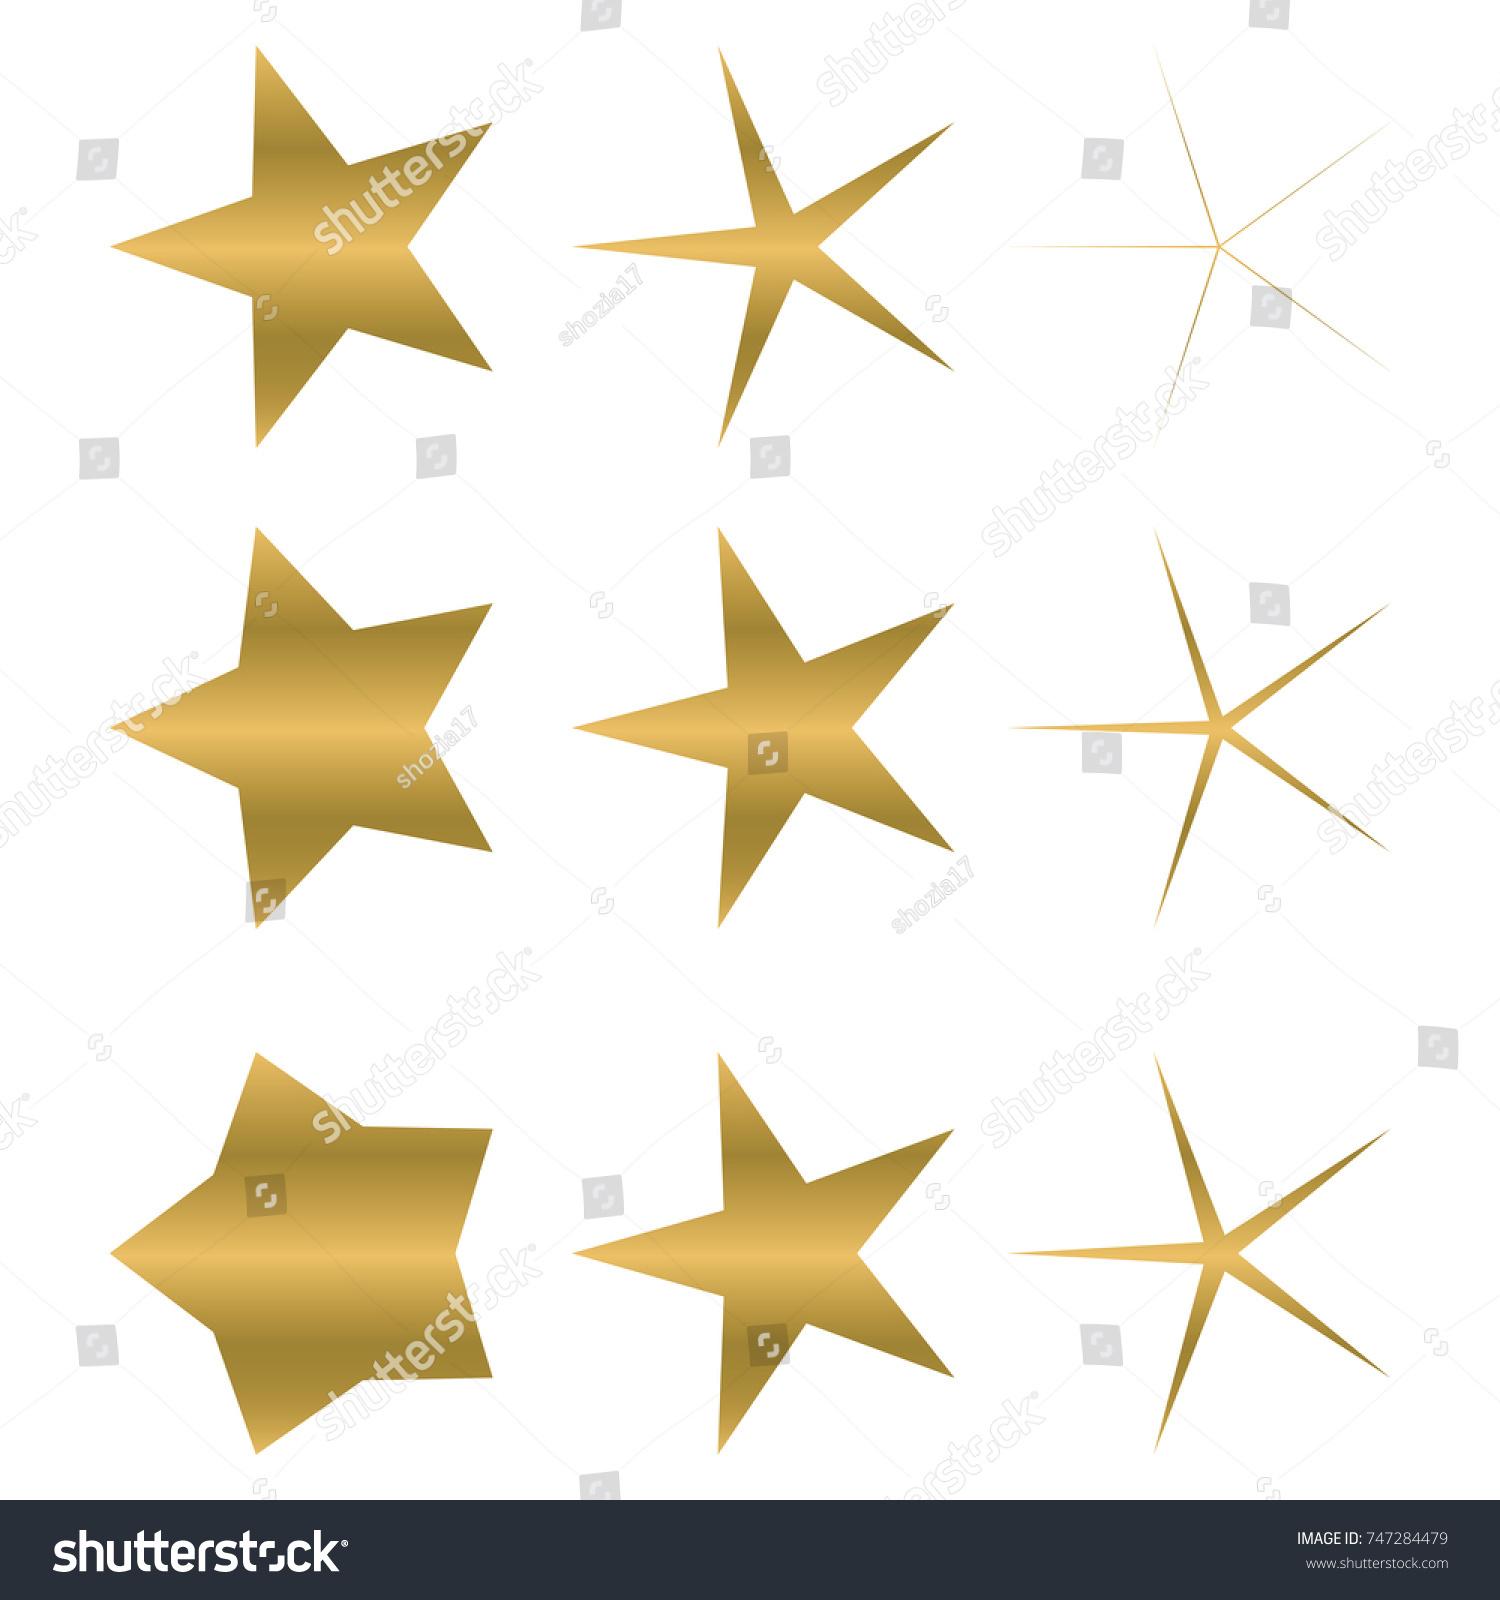 Star vector icon star icon vector stock vector 747284479 star vector icon star icon vector star icon star vector gold sciox Images